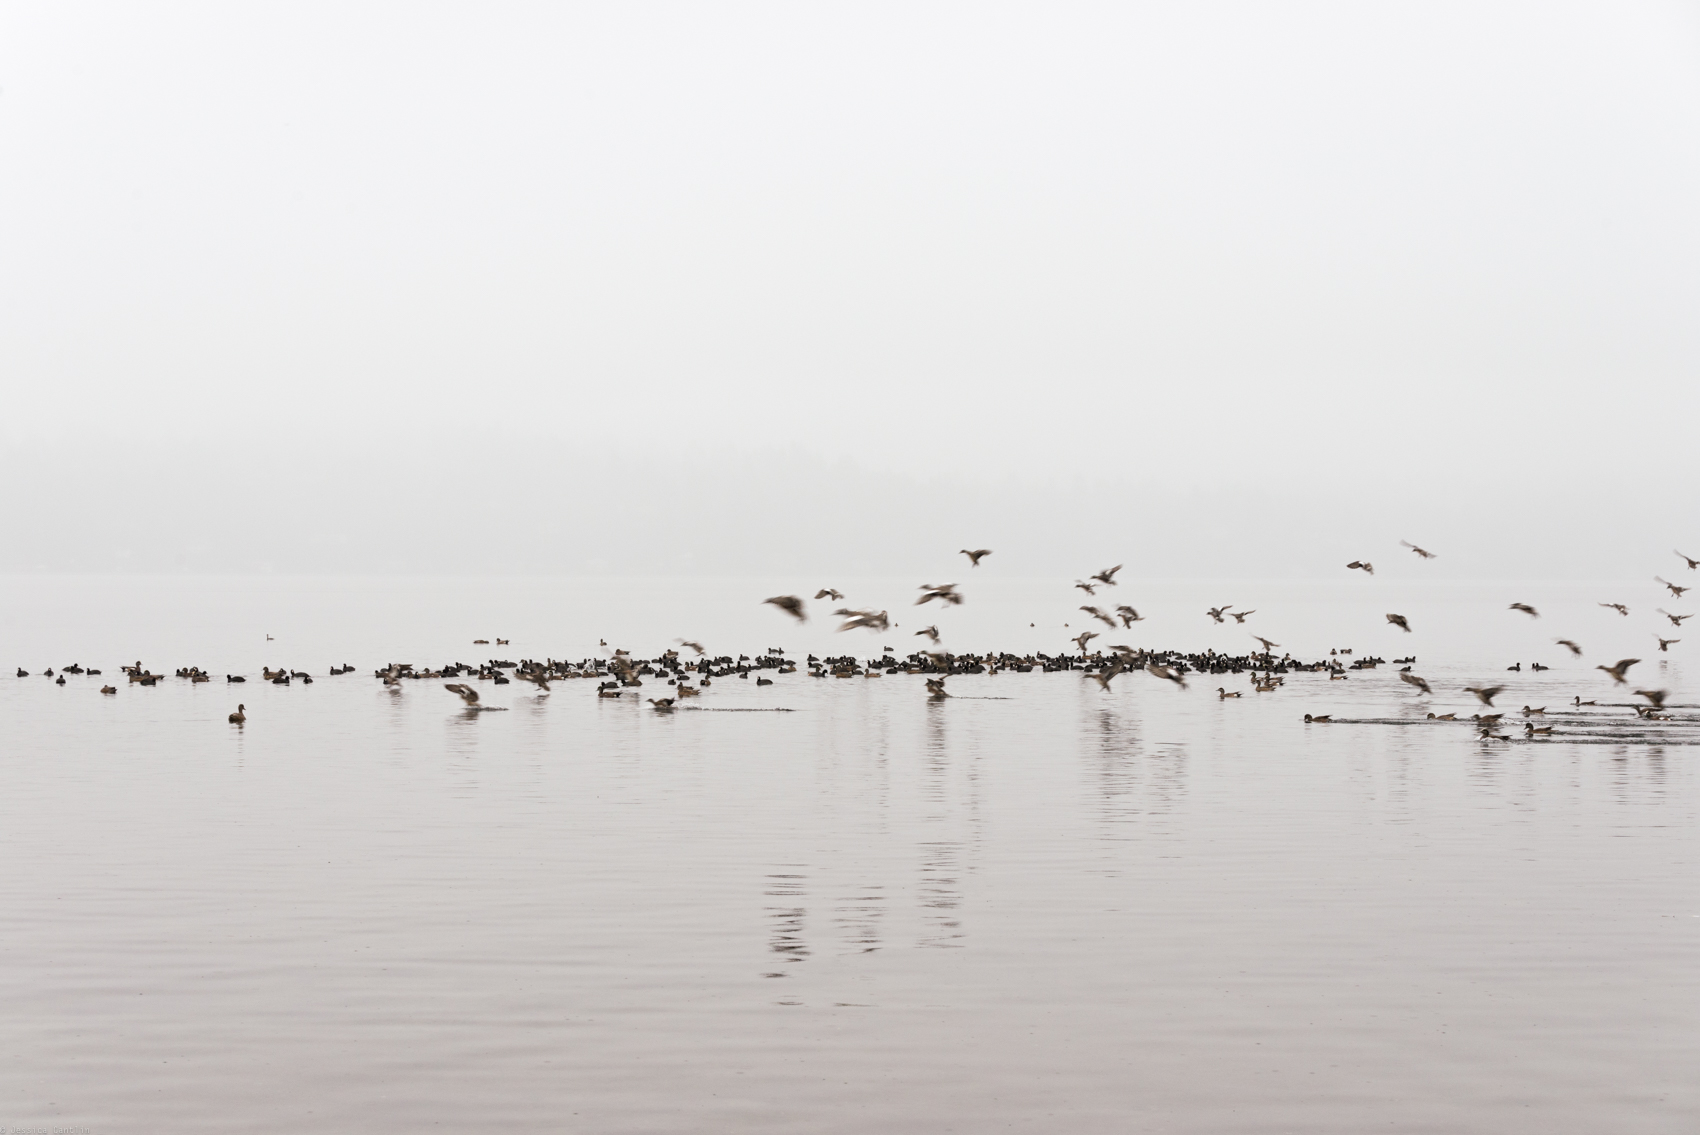 Birds in Fog No. 1 ★ Washington, 2015